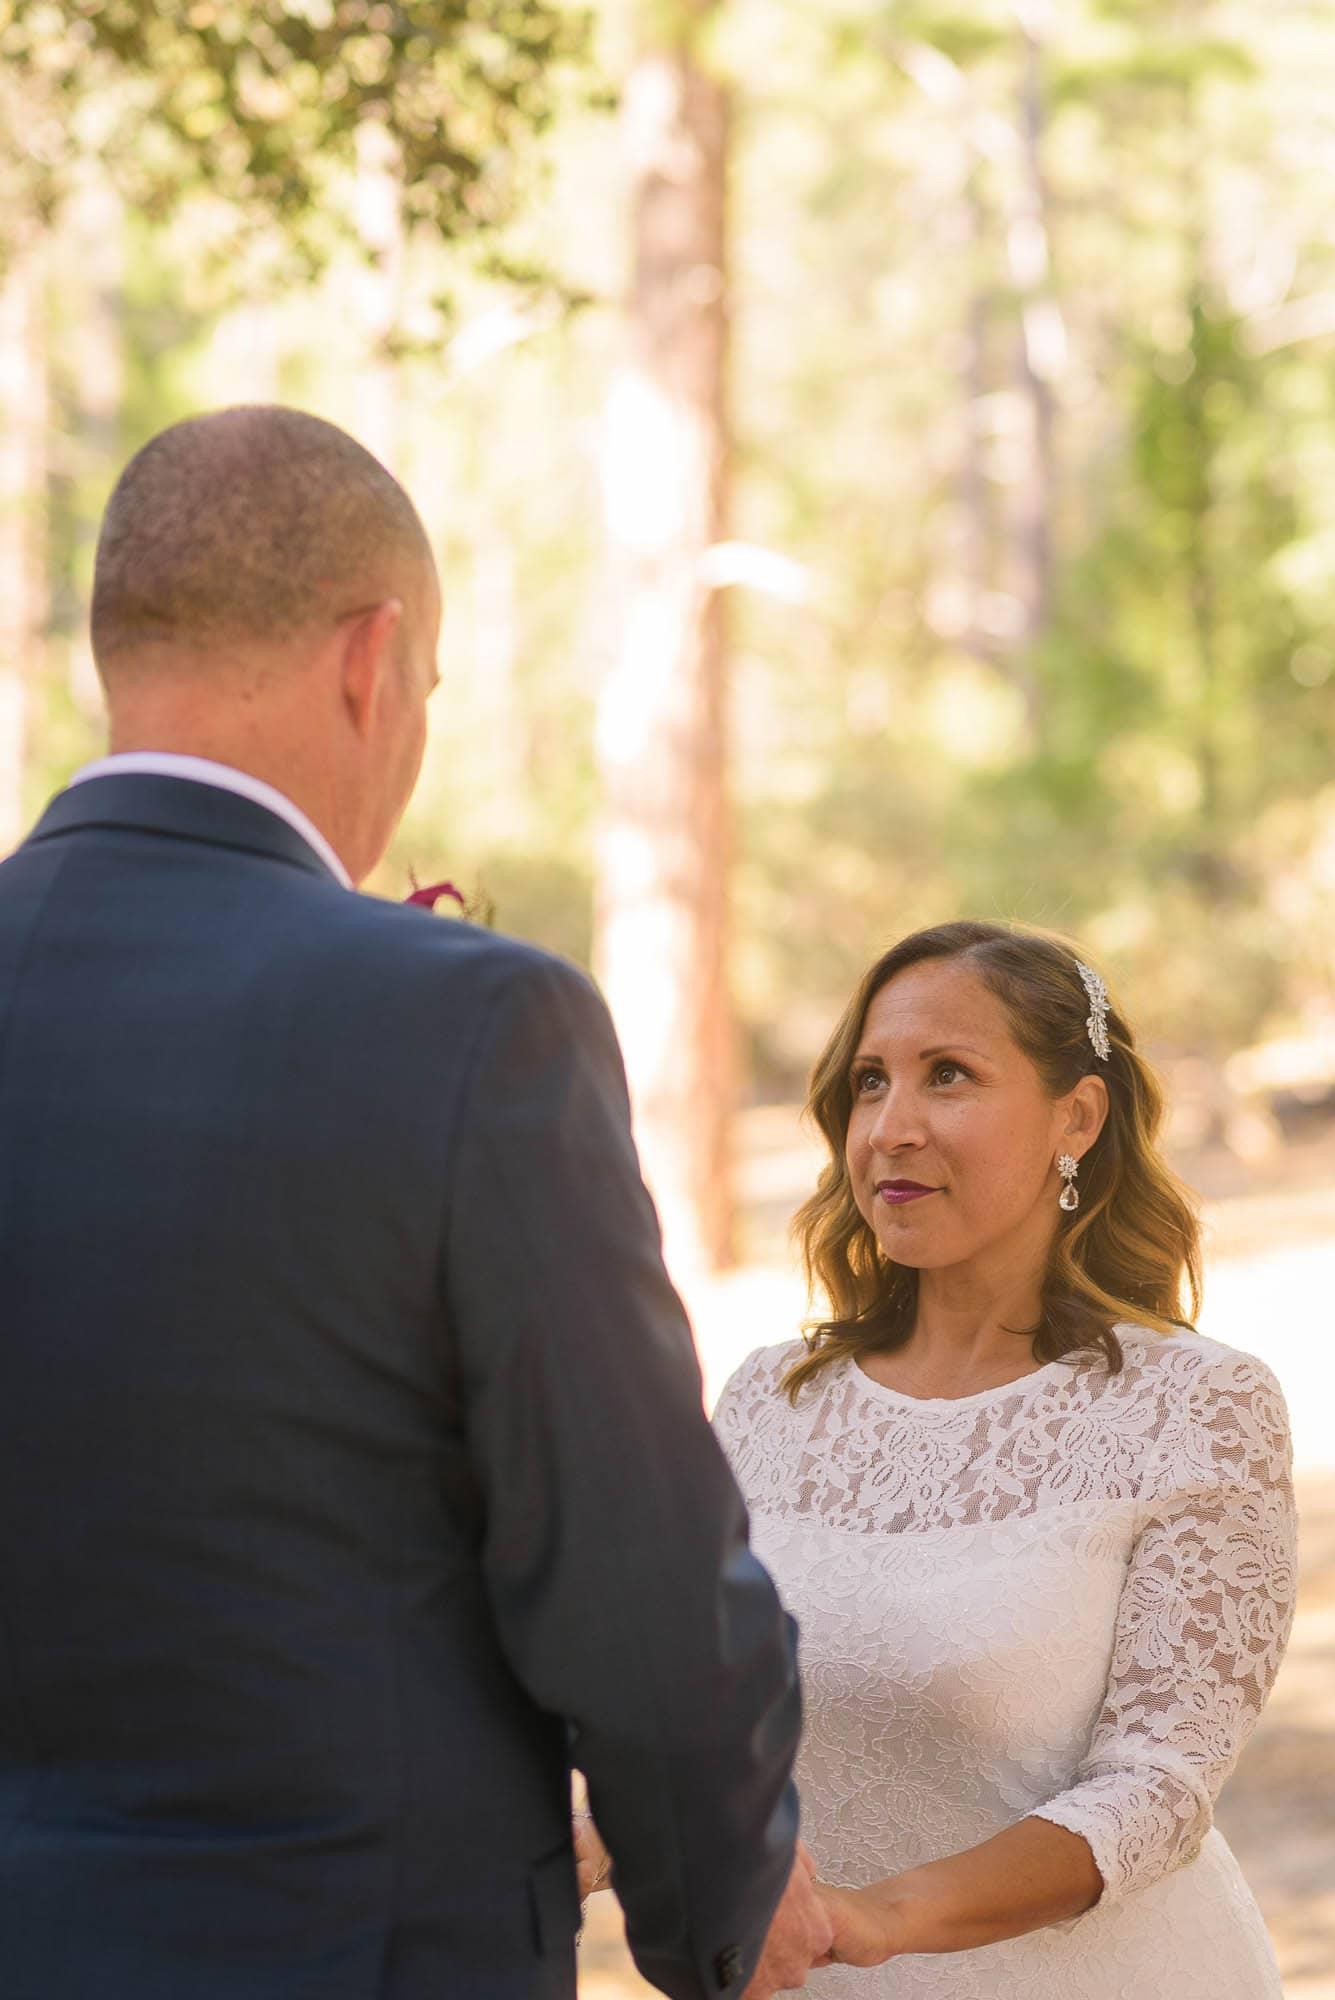 017_Alan_and_Heidi_Wedding_Jackie_Dannon